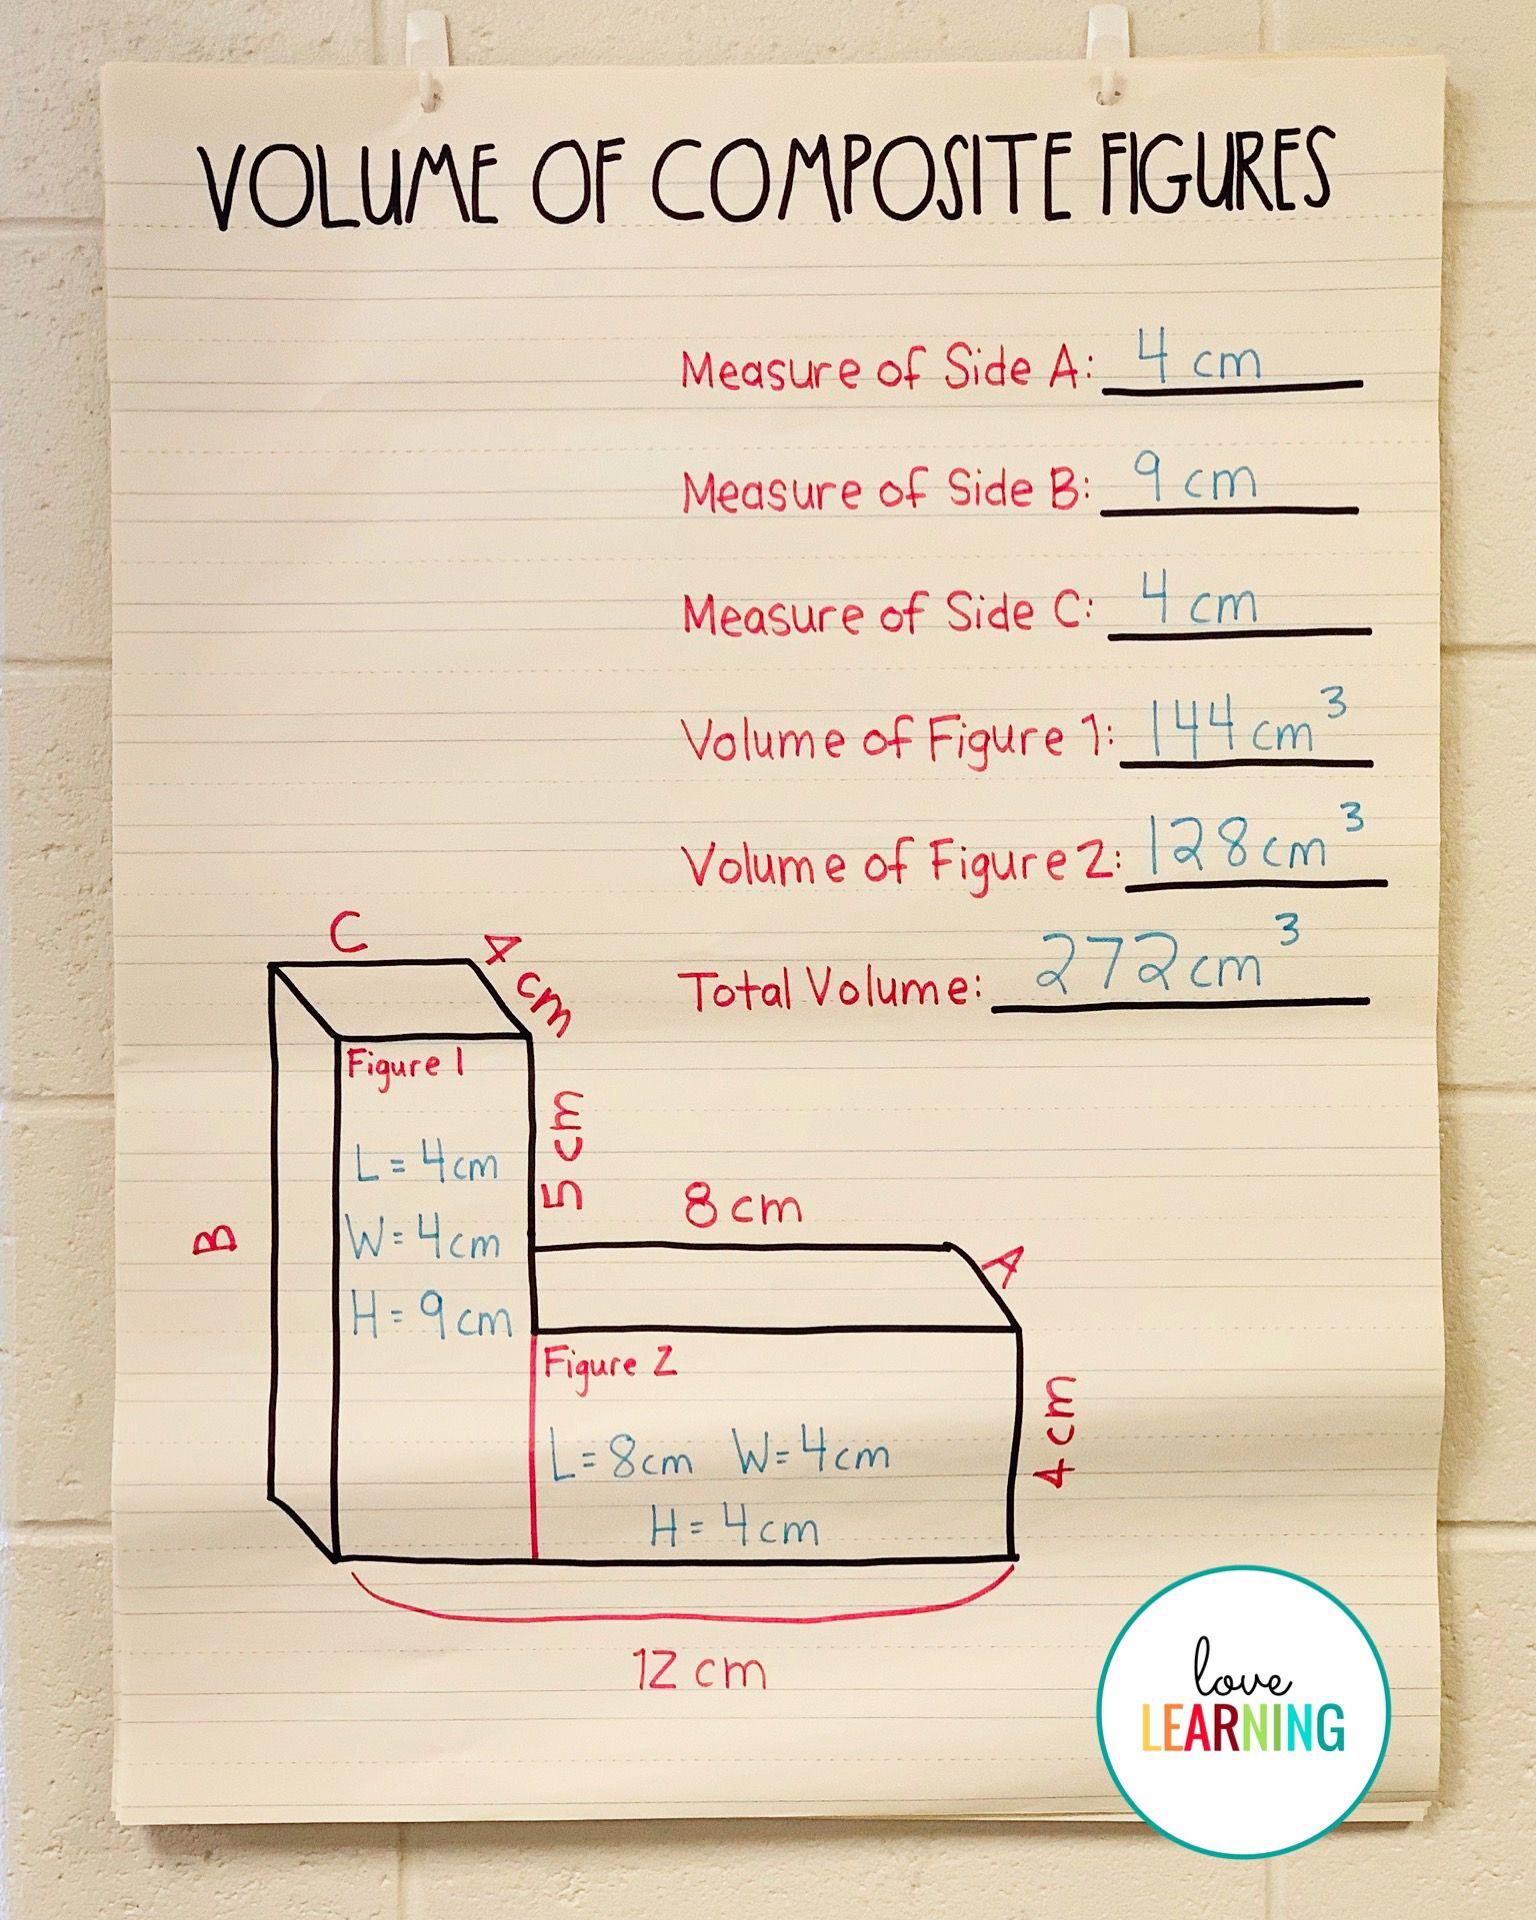 hight resolution of Volume of Composite Figures   Math methods